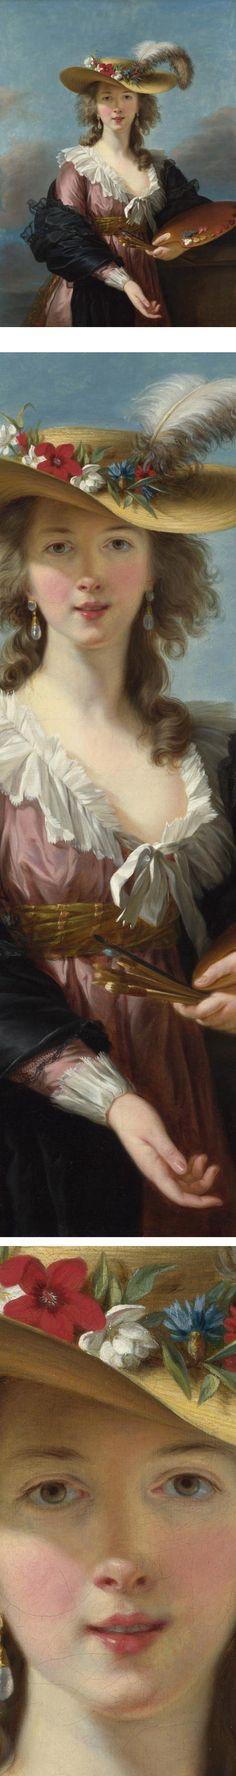 Self Portrait in a Straw Hat, Elisabeth Louise Vigee Le Brun